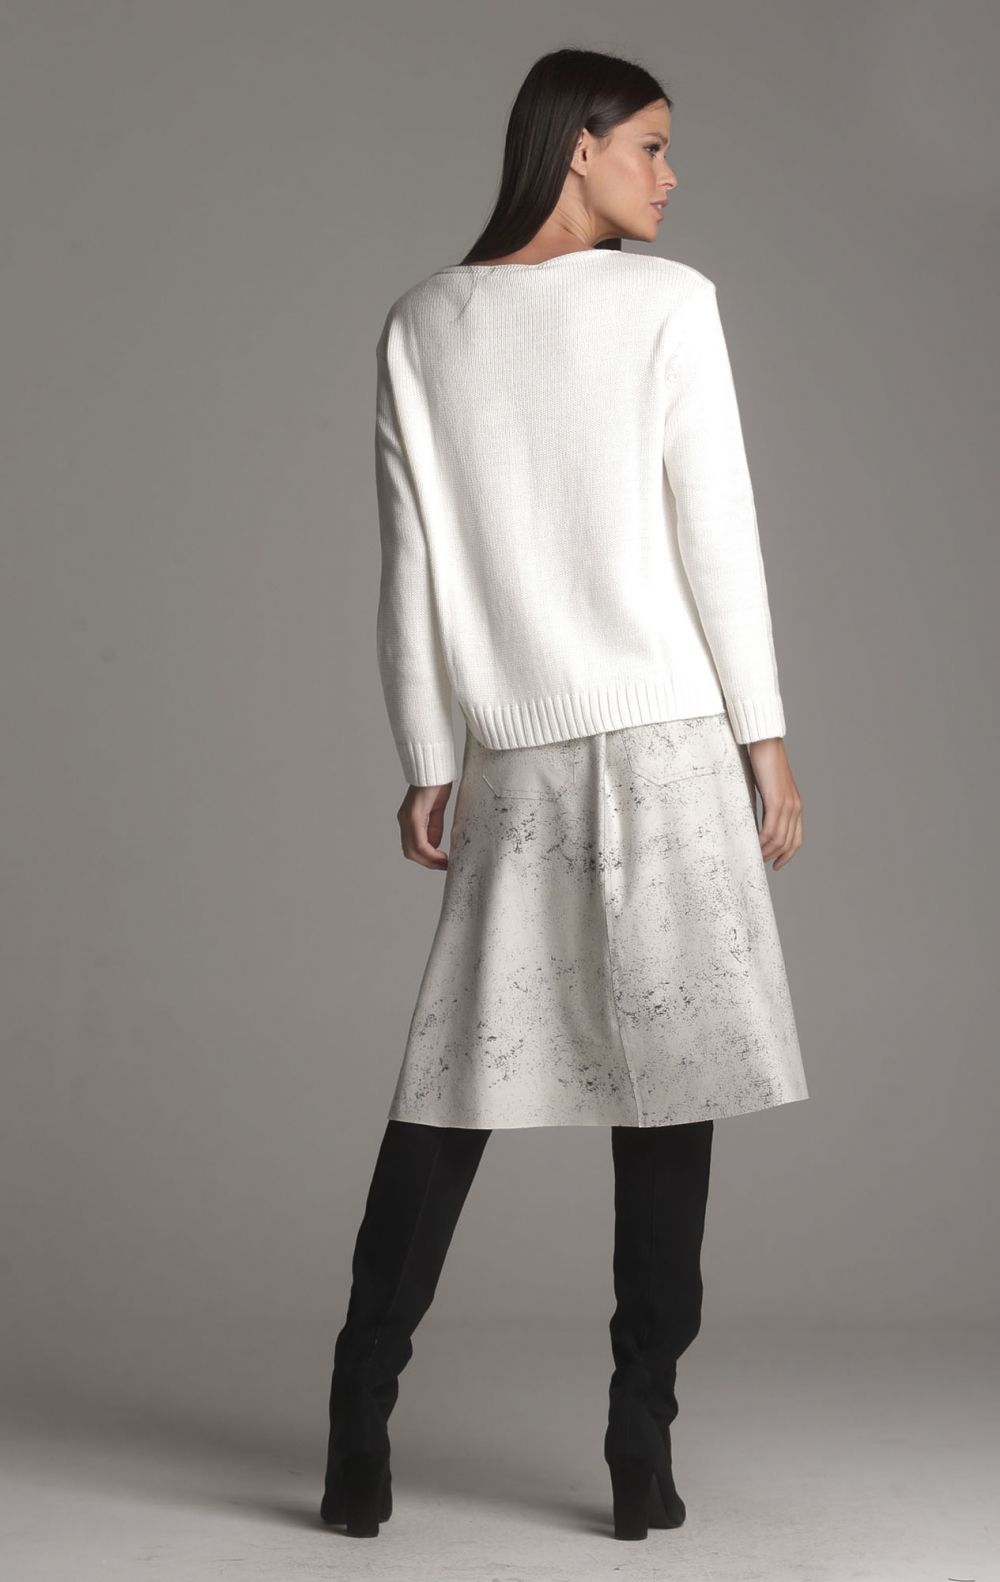 Blusa Tricot Tania Off White - Foto 2